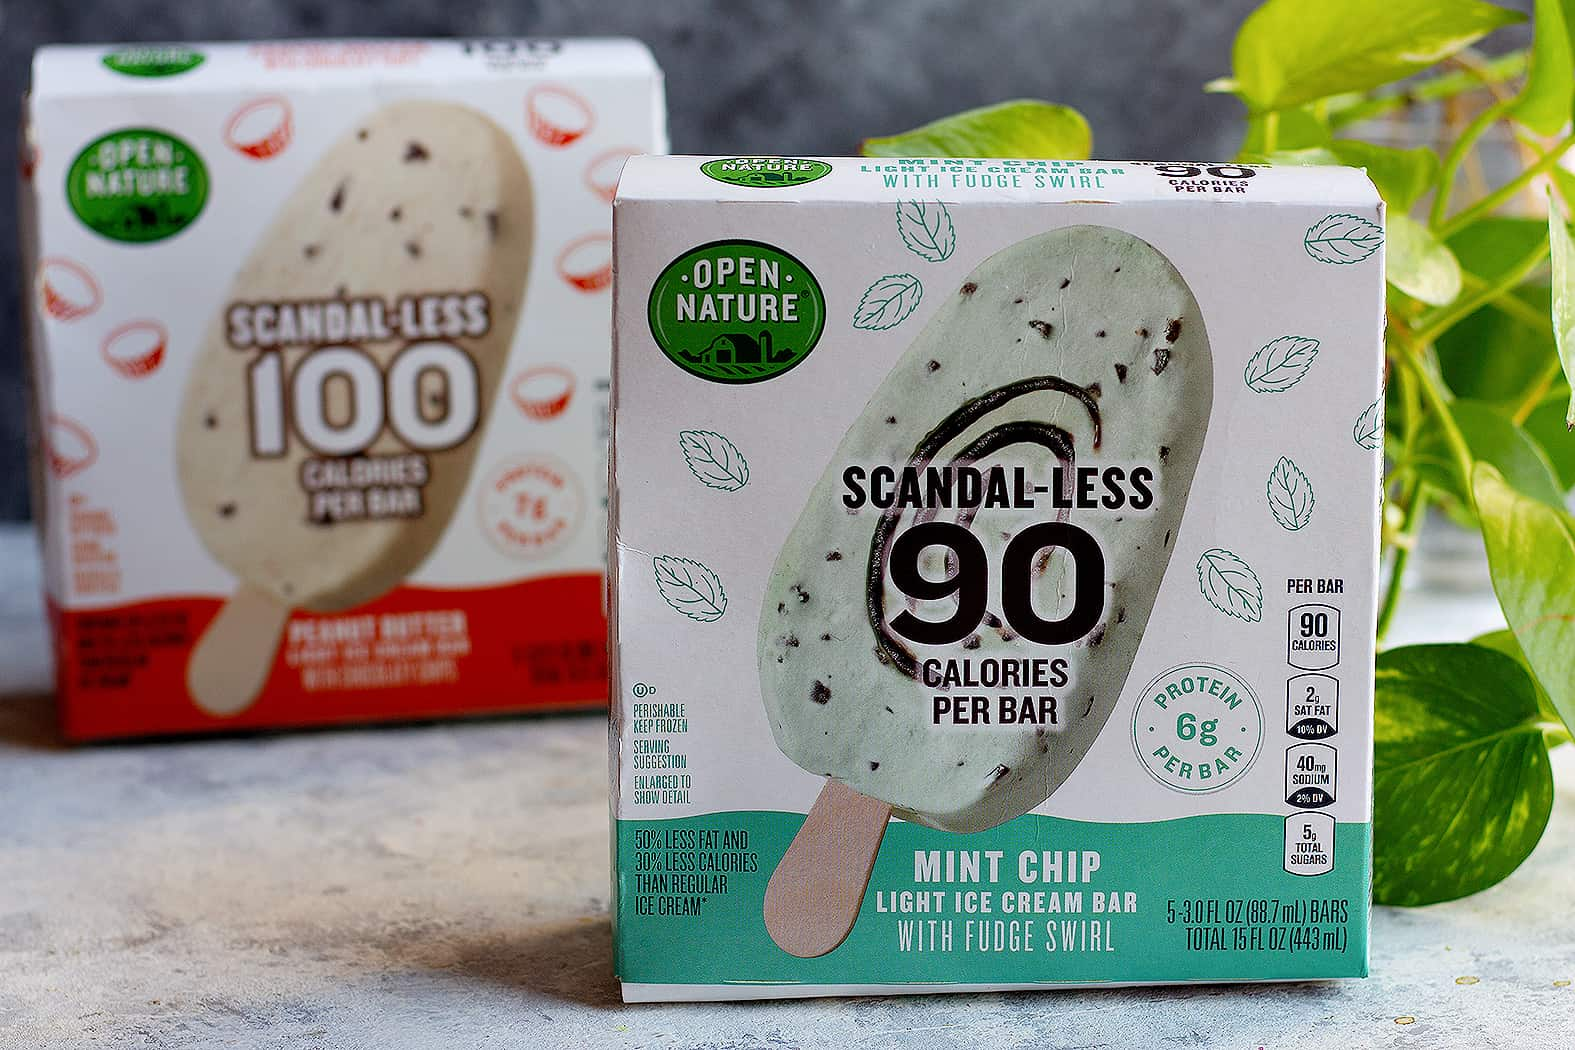 scandal-less ice cream bars